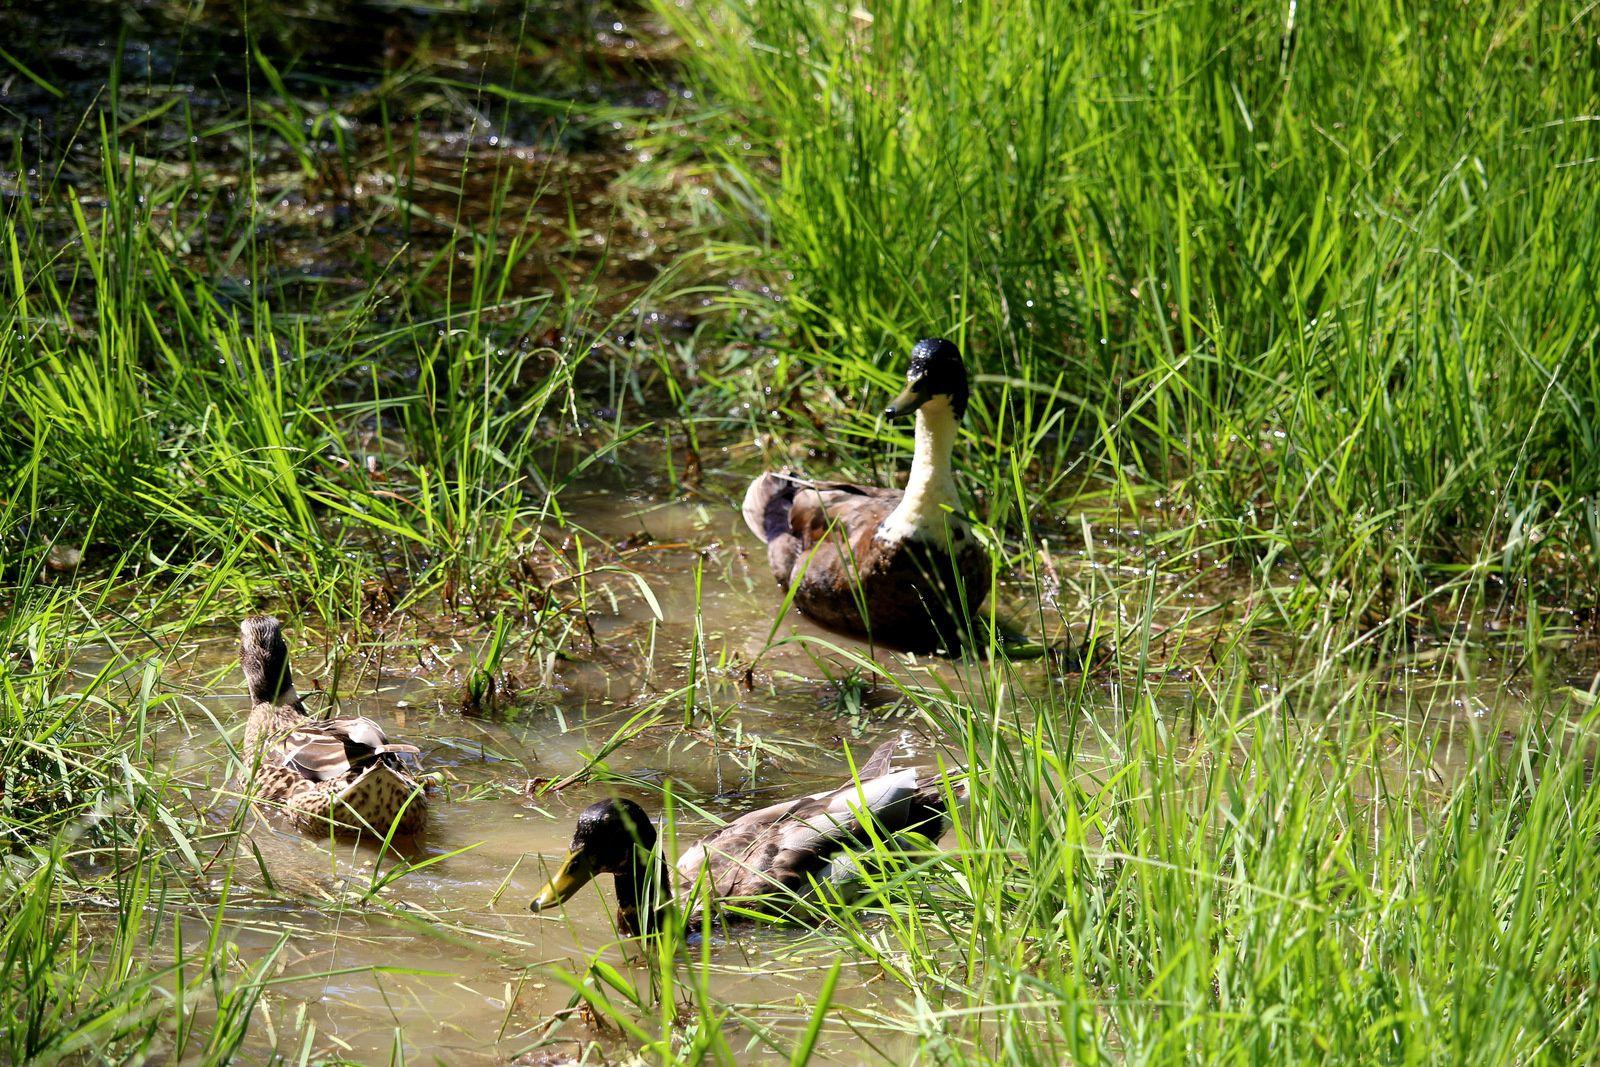 Canards en forêt de Saint-Germain-en-Laye (juin 2015)